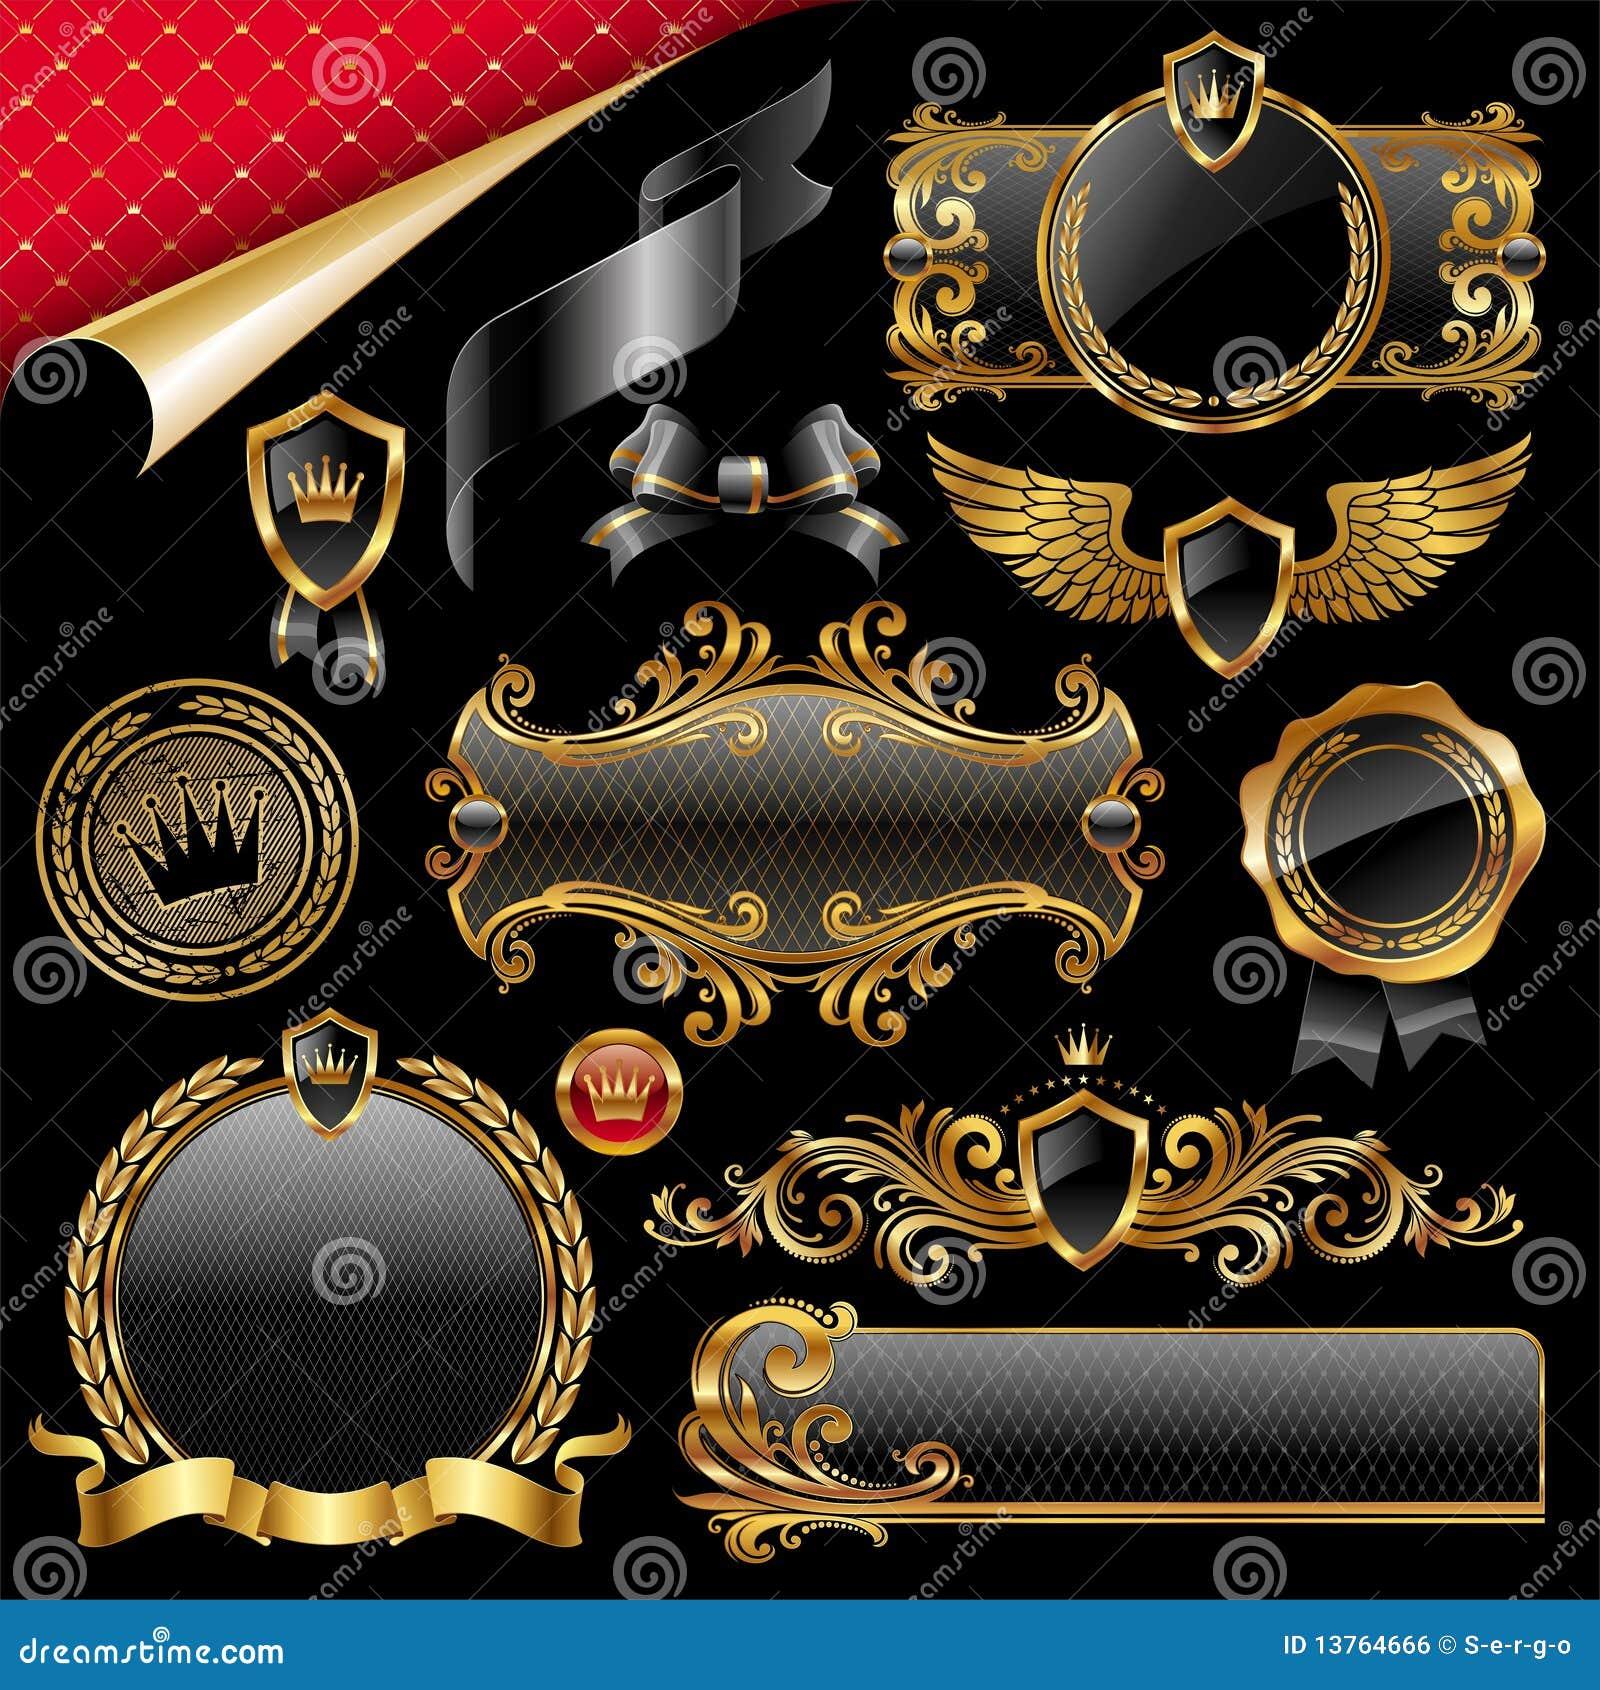 Set of gold and black design elements